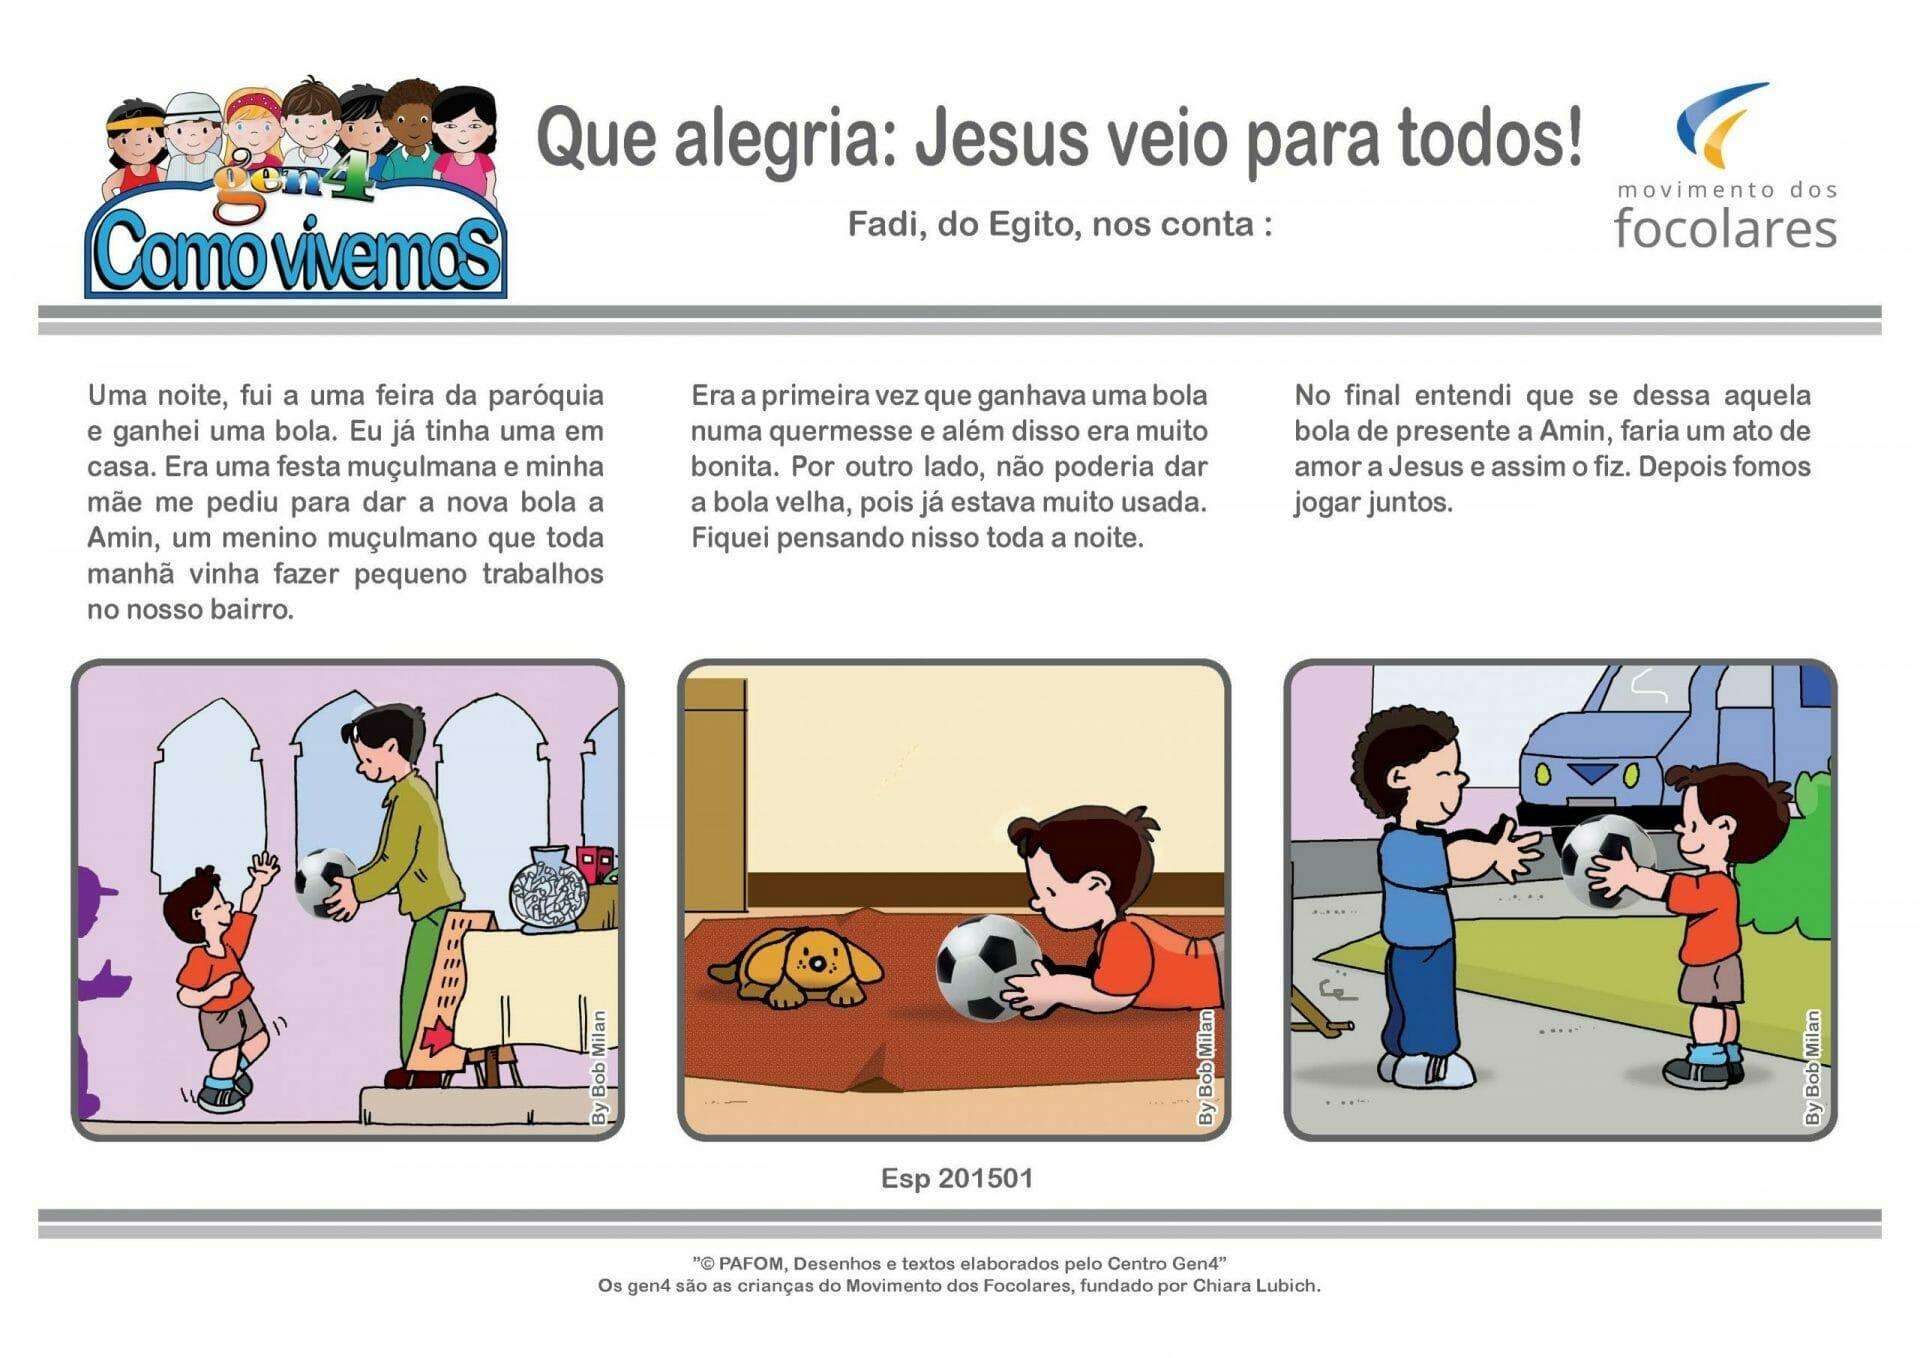 Que alegria: Jesus veio para todos!